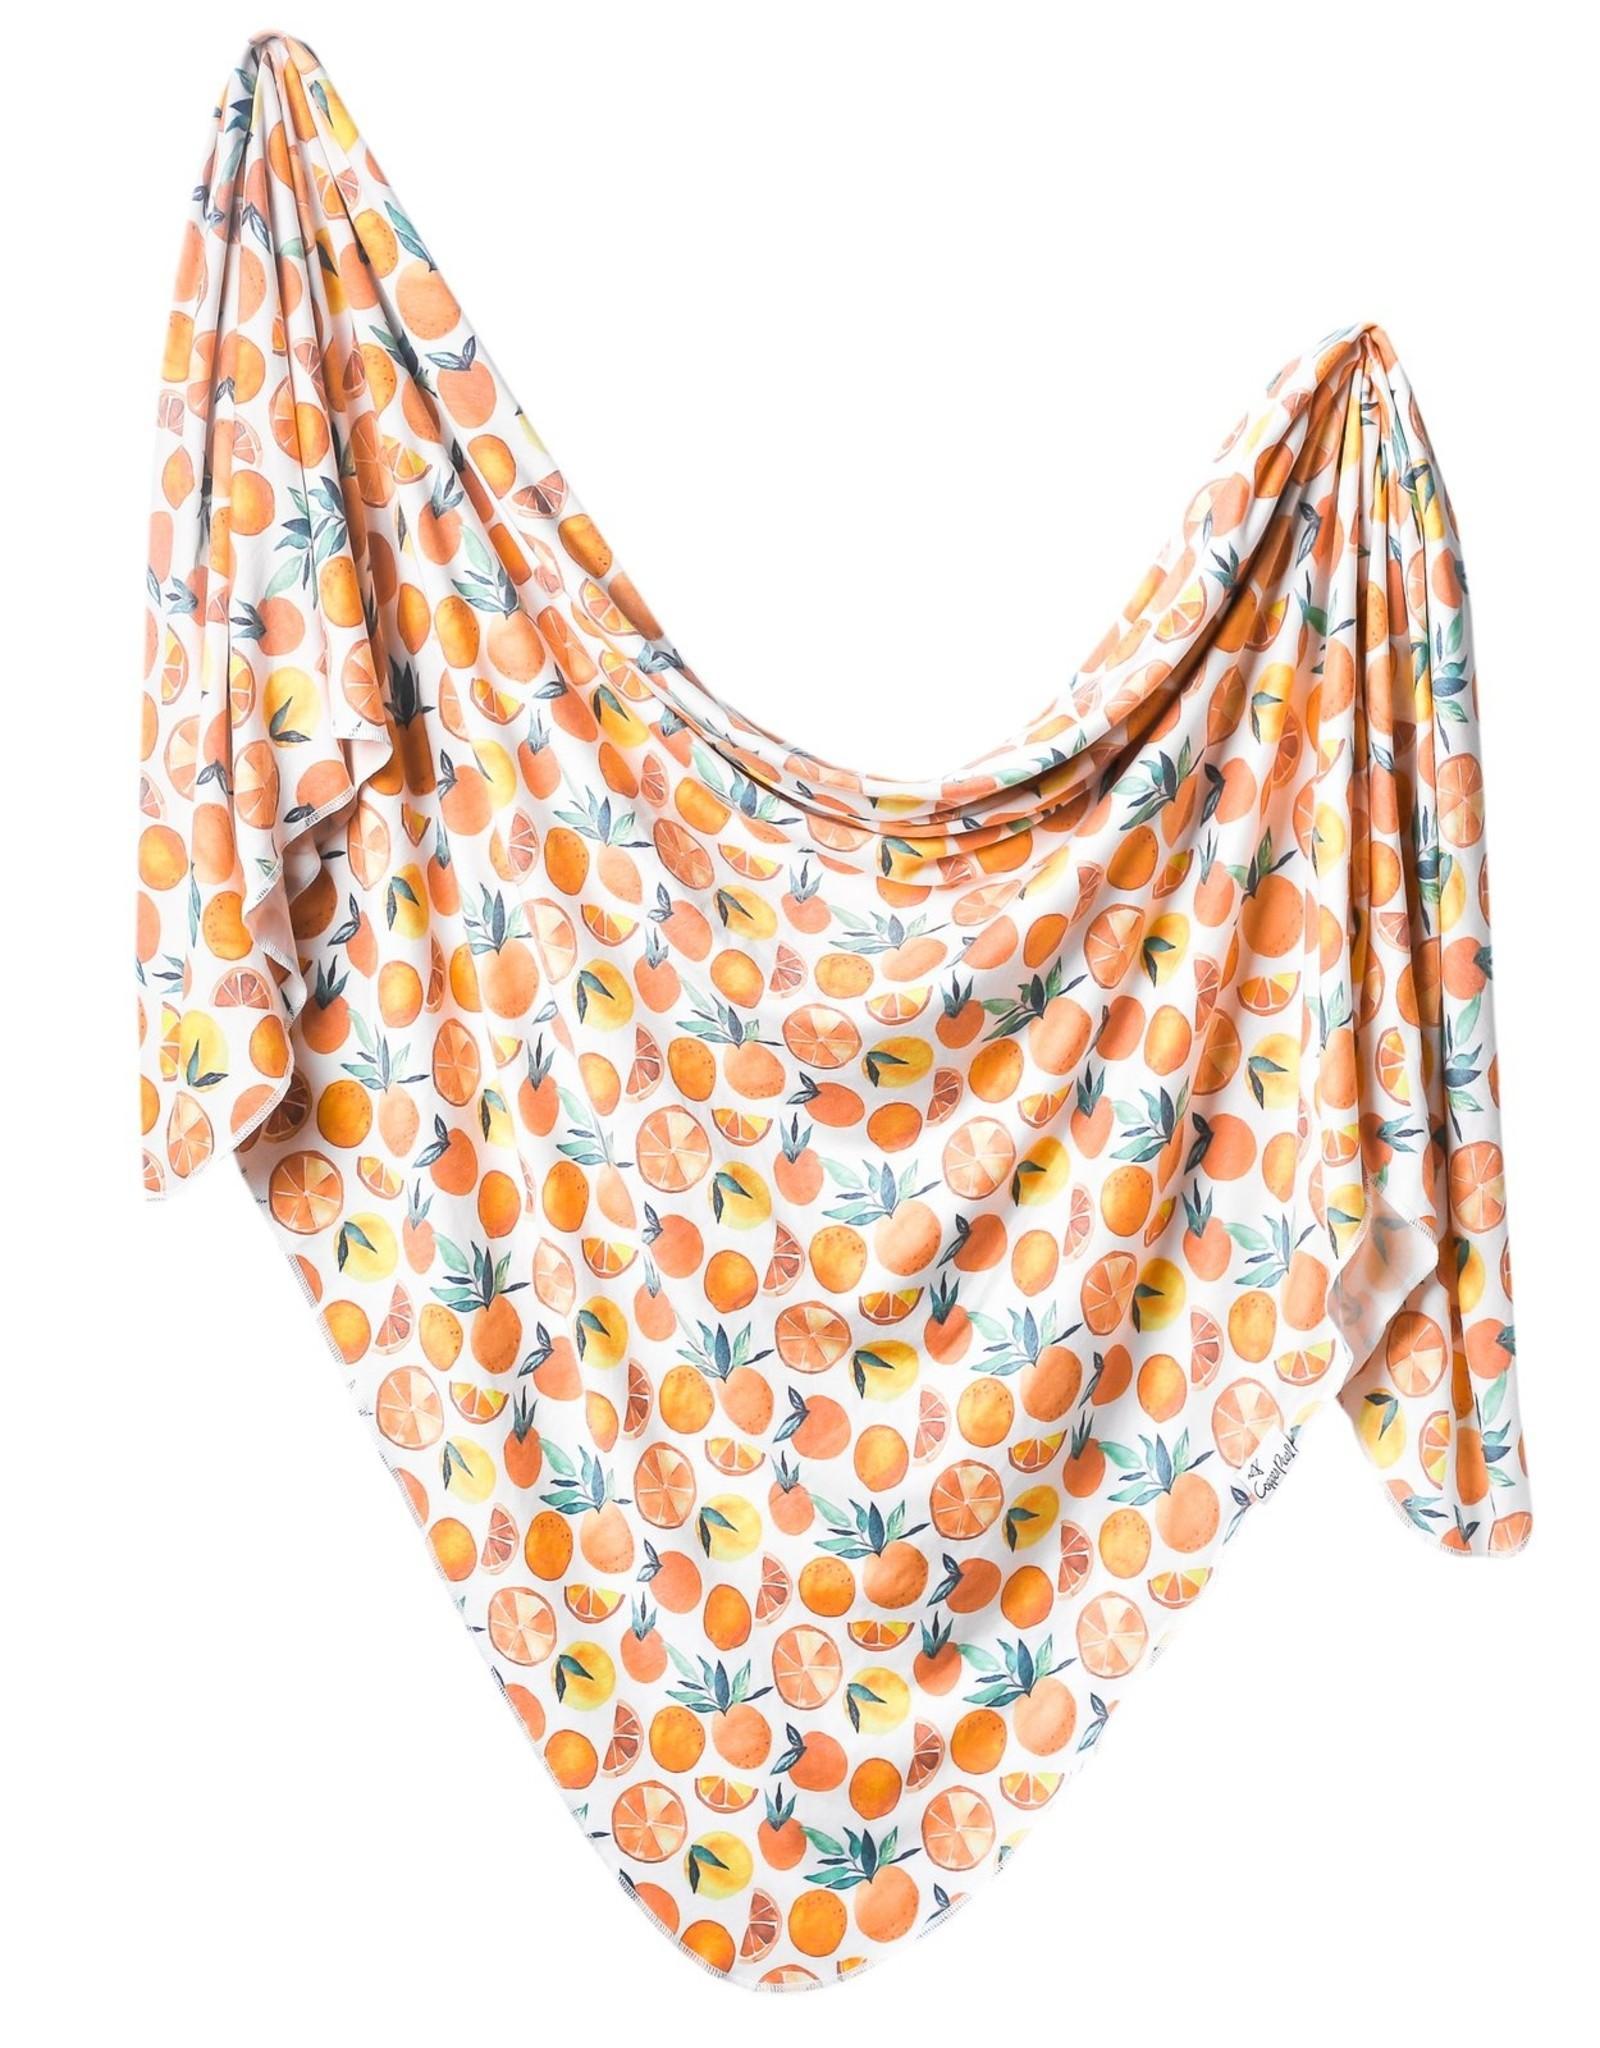 Copper Pearl Citrus Swaddle Blanket Copper Pearl